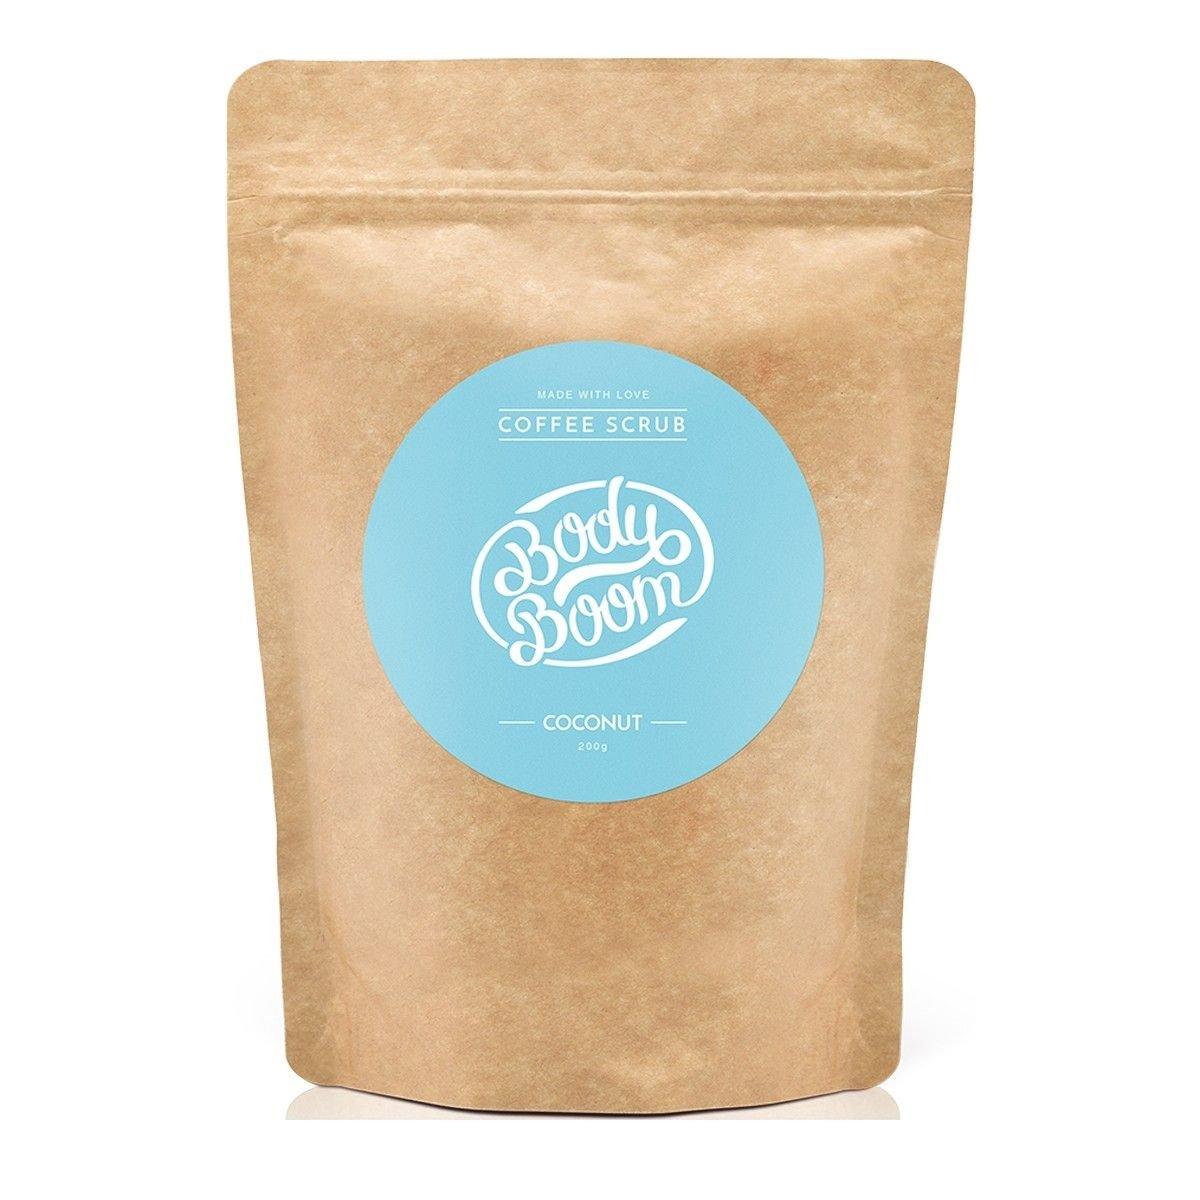 Afbeelding van Bodyboom Coffee Scrub Coconut Bodyscrub Beauty